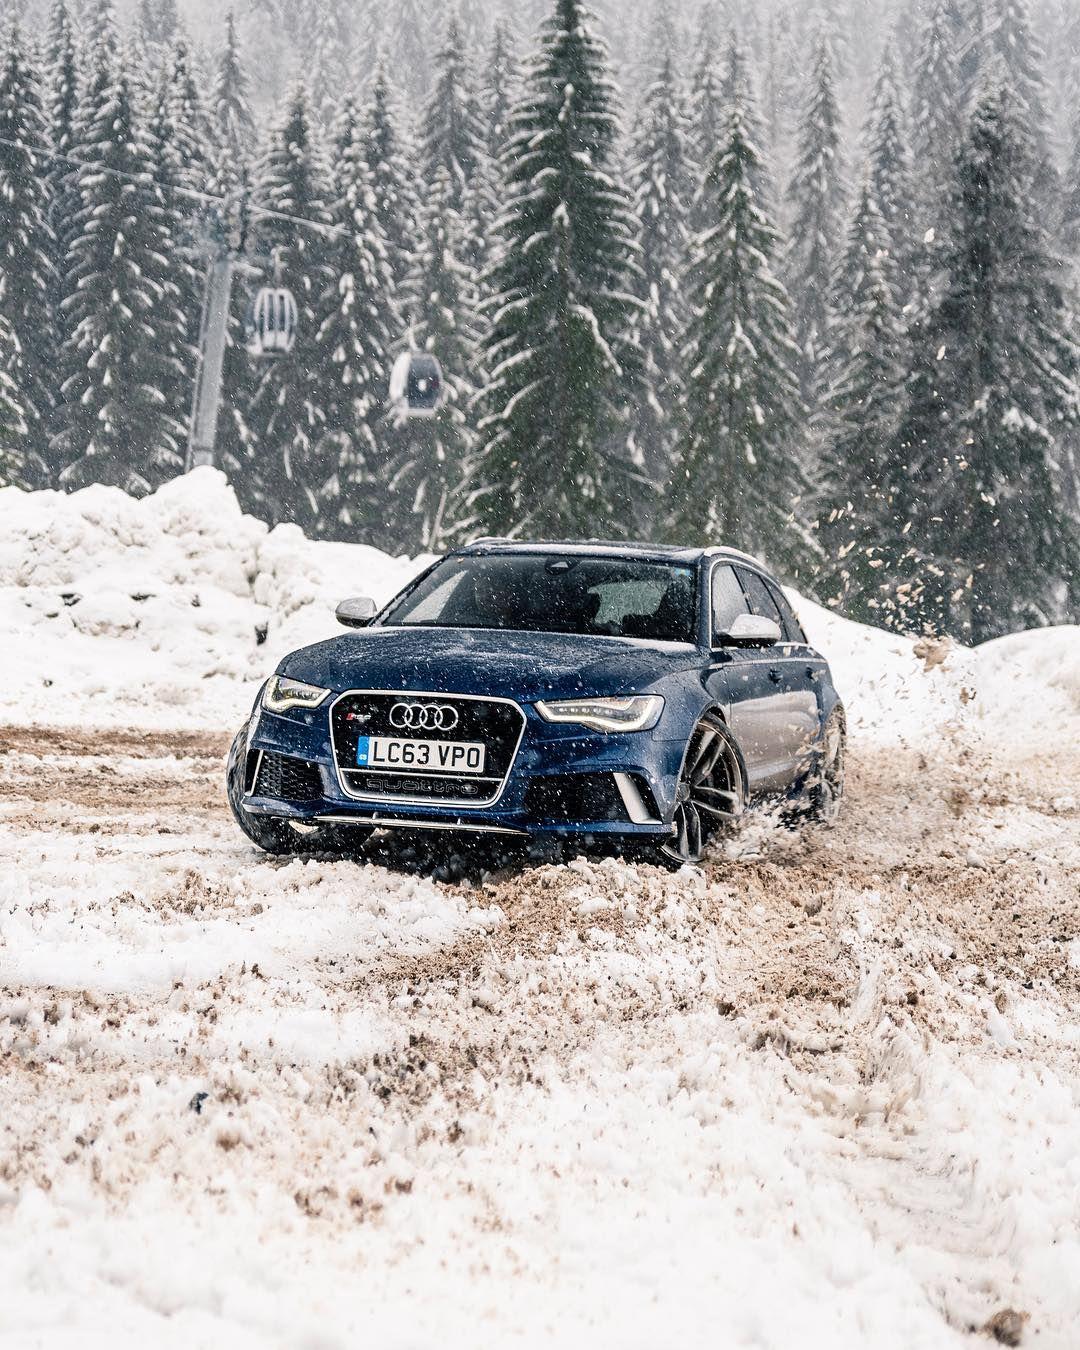 Alex Babington On Instagram The Ultimate Winter Beater Lathouras P Audi Rs6 Audi Cars Winter Car Audi Rs6